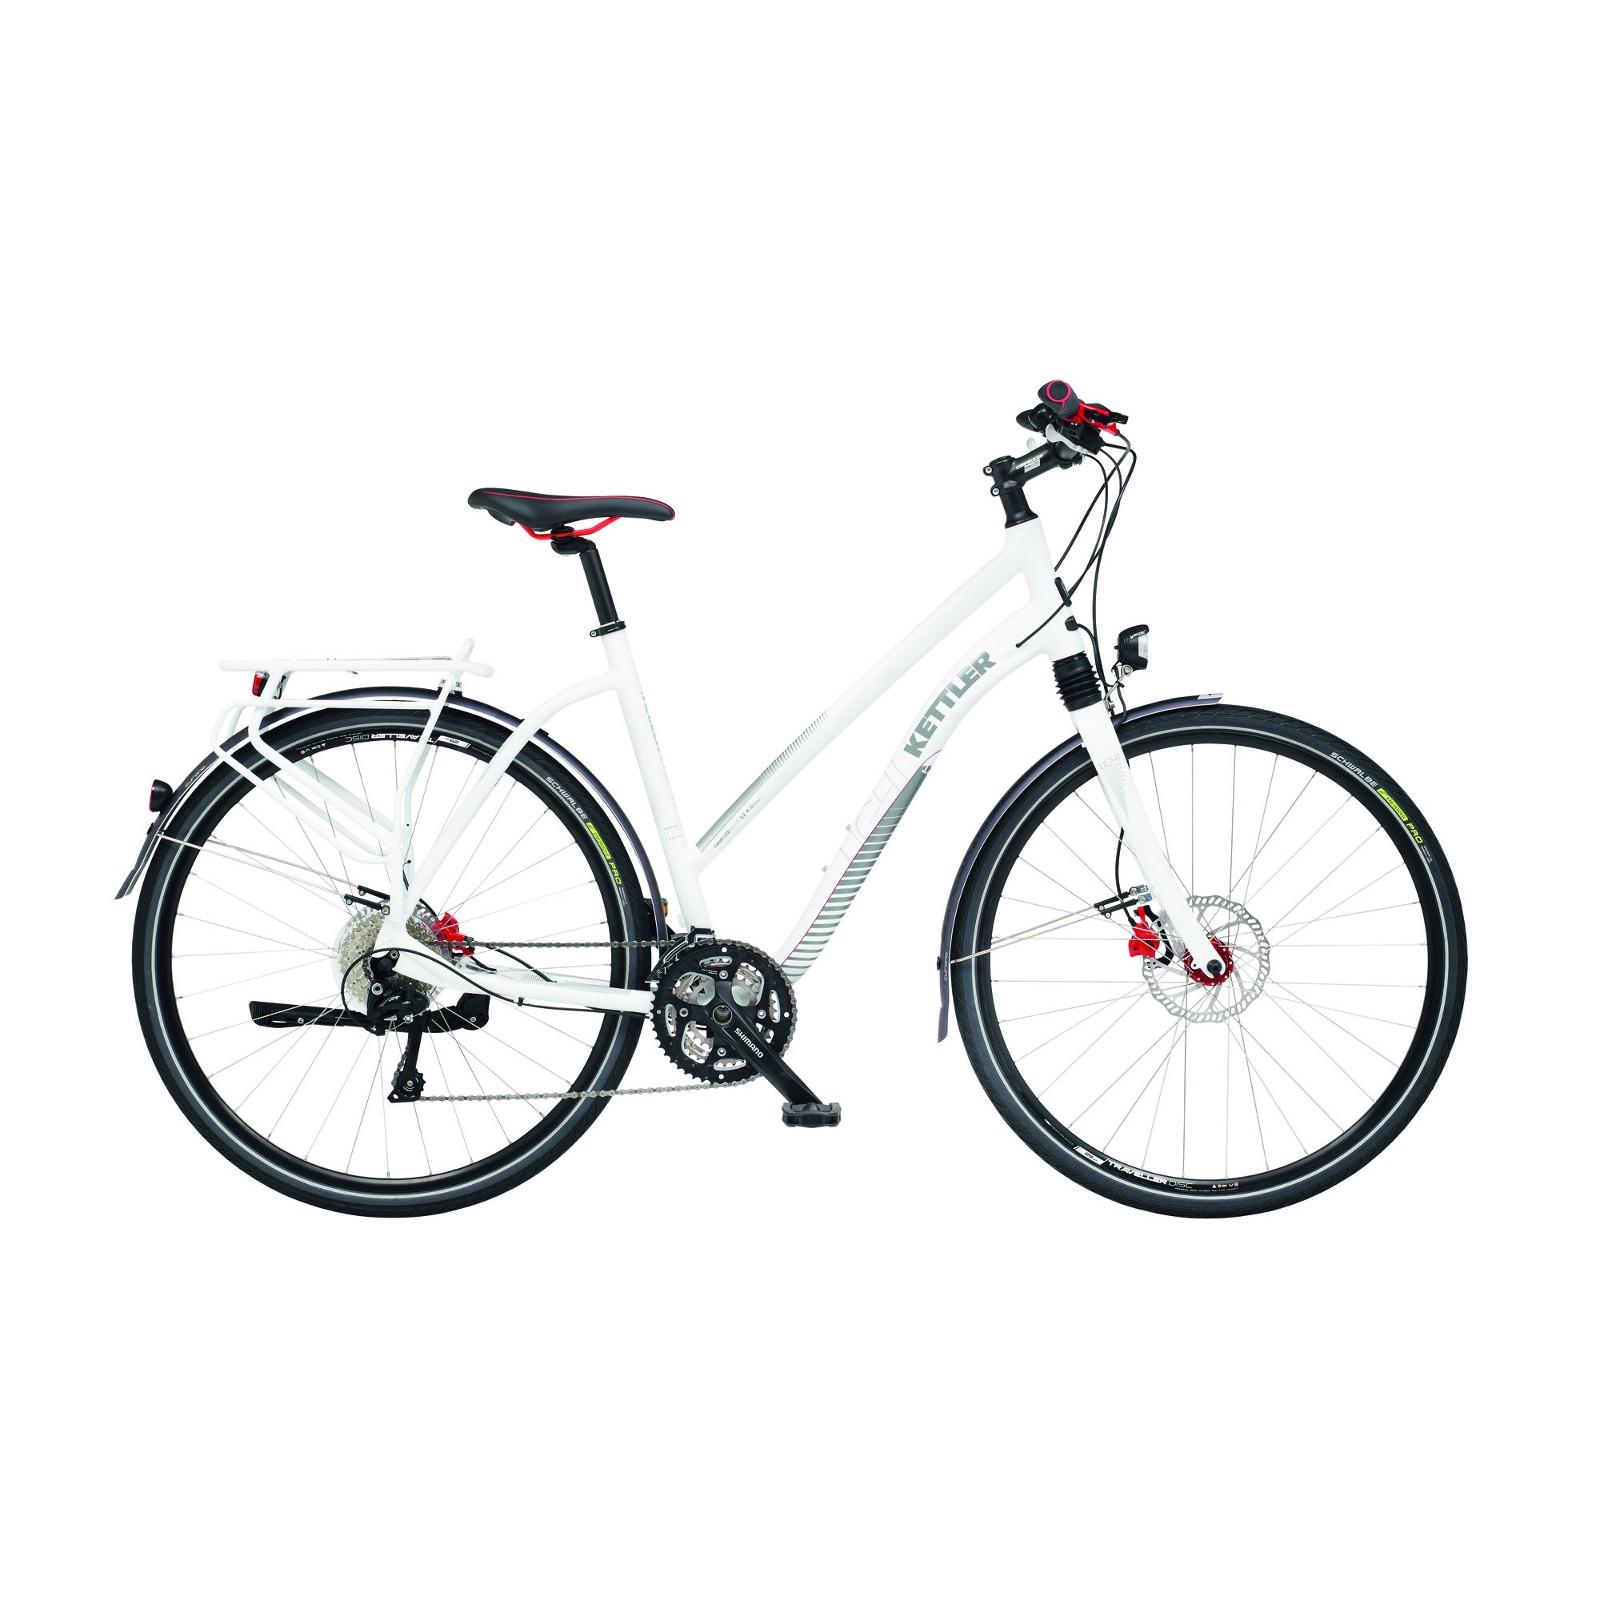 kettler fahrrad trekking traveller 12 4 light trapez 28. Black Bedroom Furniture Sets. Home Design Ideas